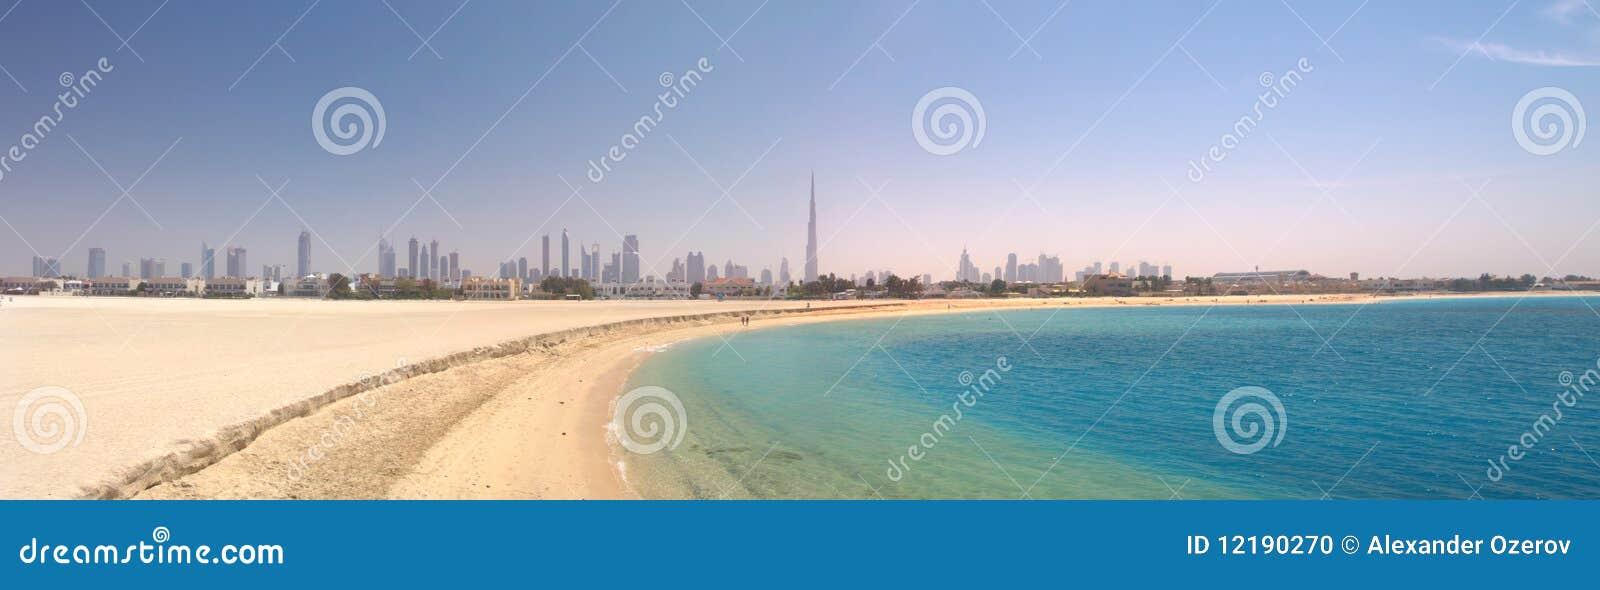 Dubai. Panorama da praia e do mar bonitos